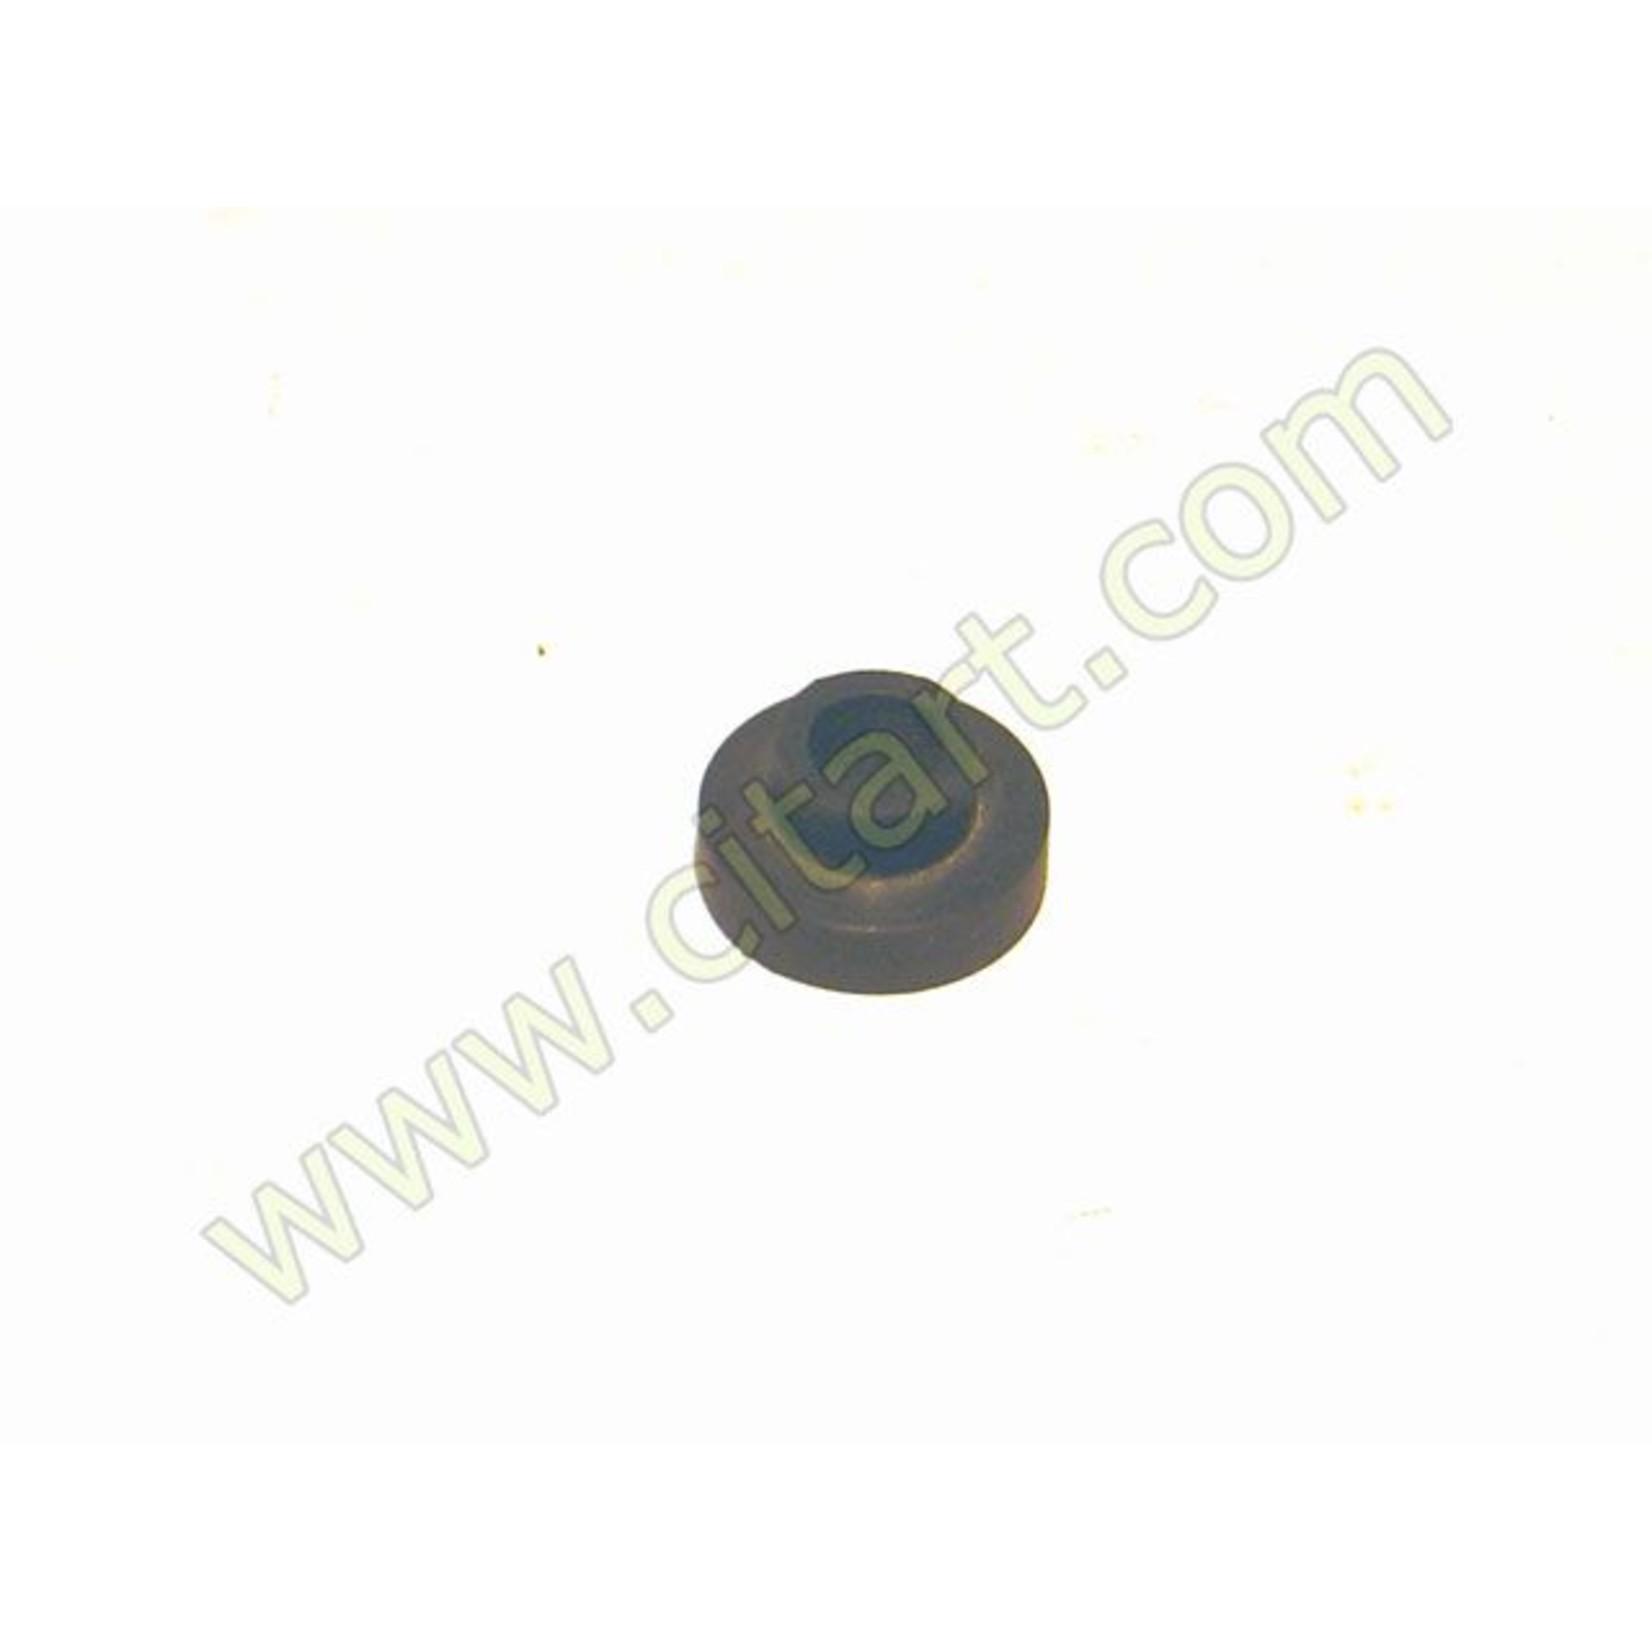 Kachelhuis montage rubber Nr Org: D565104